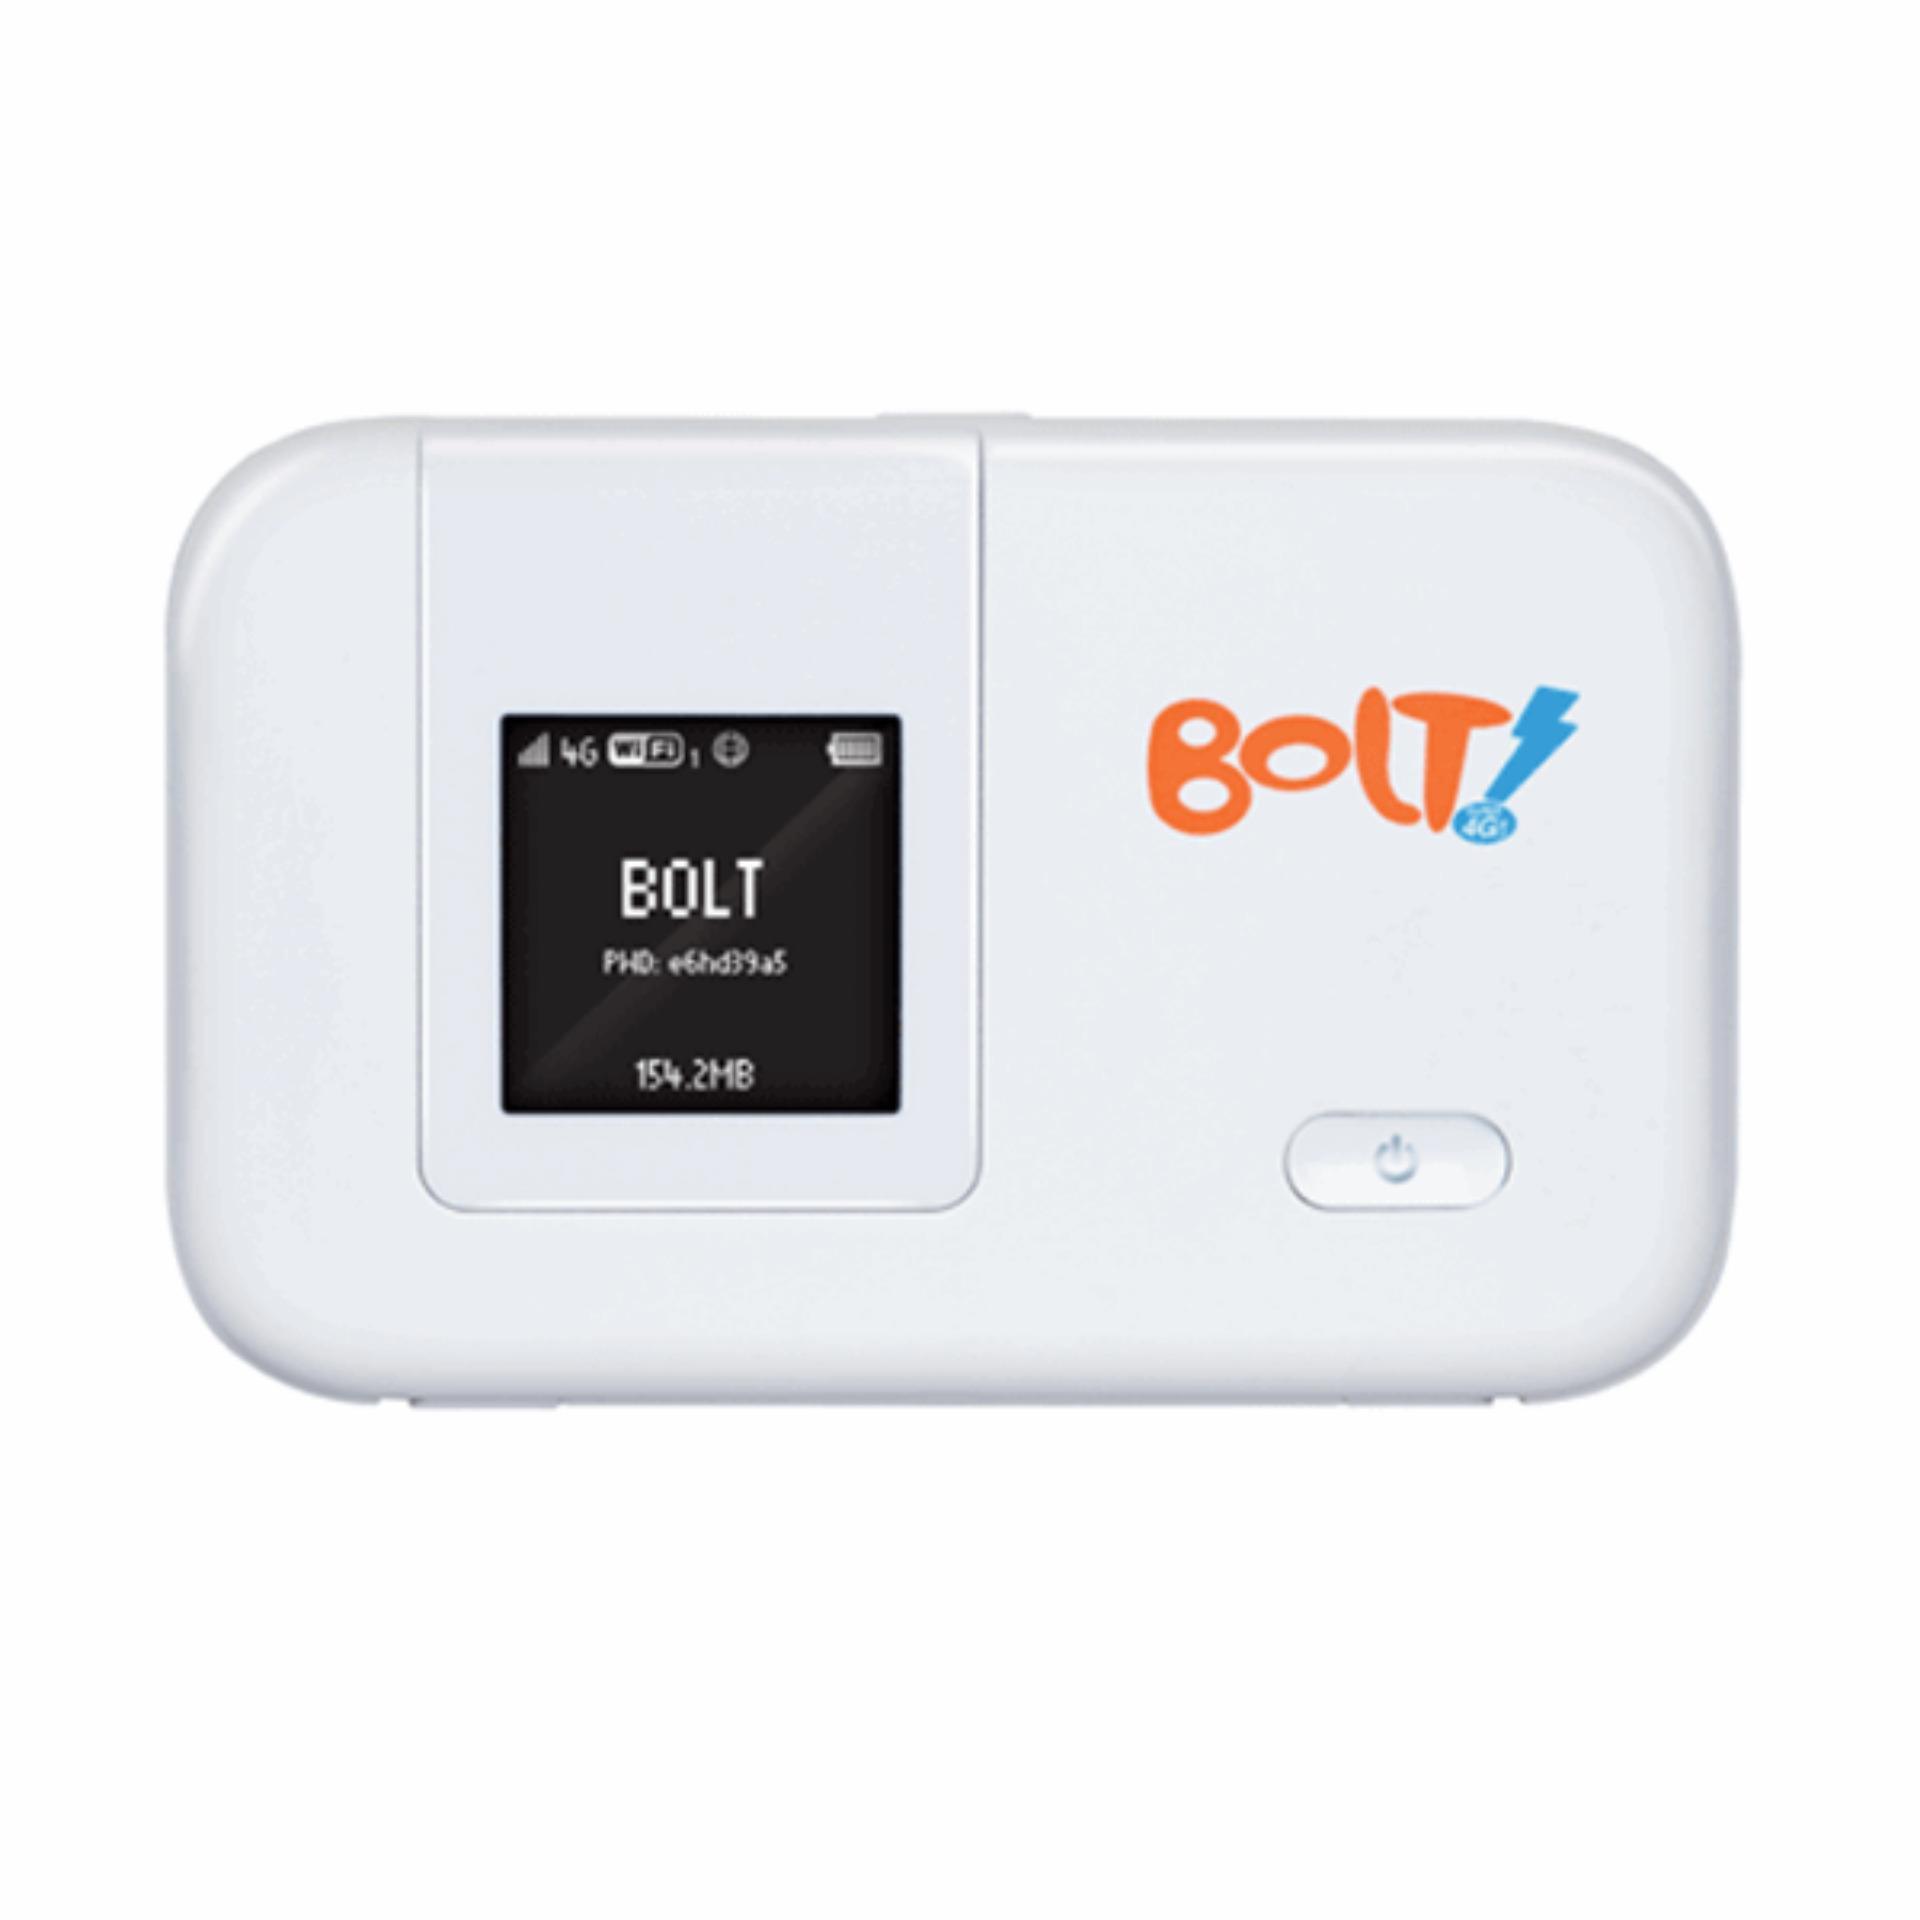 Bolt Slim Huawei E5372s - Modem Mifi 4G LTE Unlock GSM